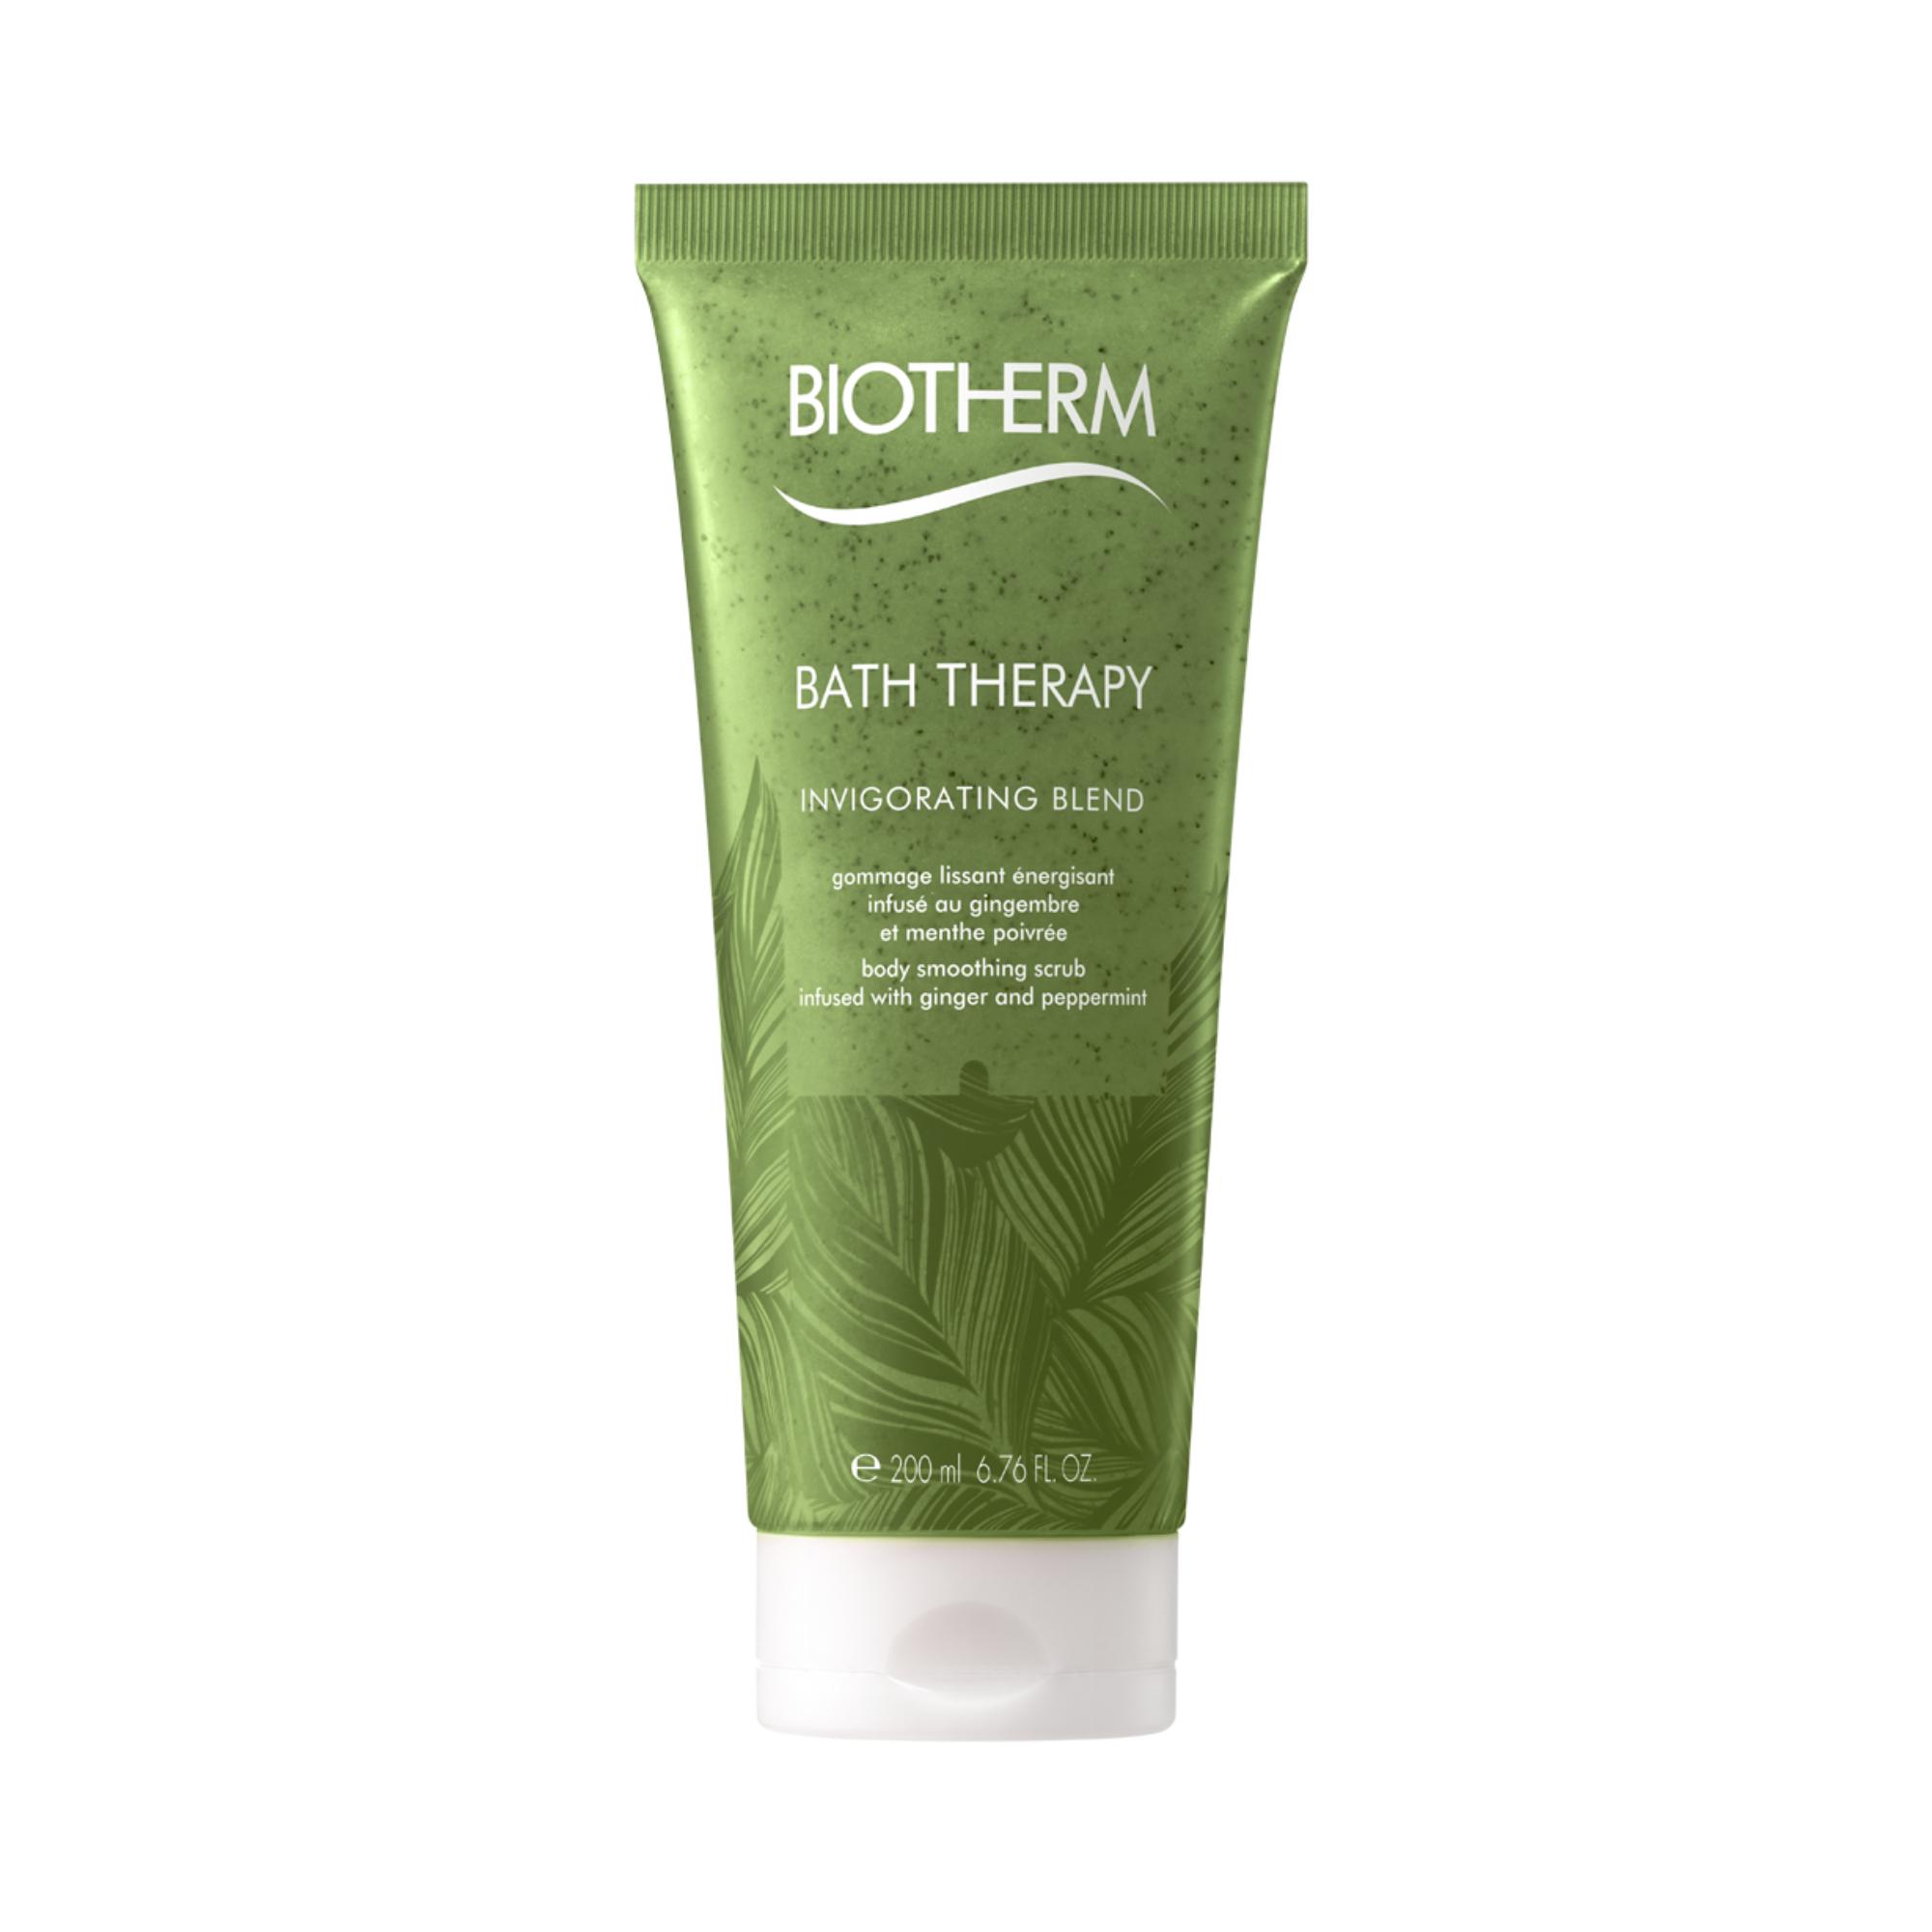 Biotherm Bath Therapy Invigorating Scrub, 200 ml